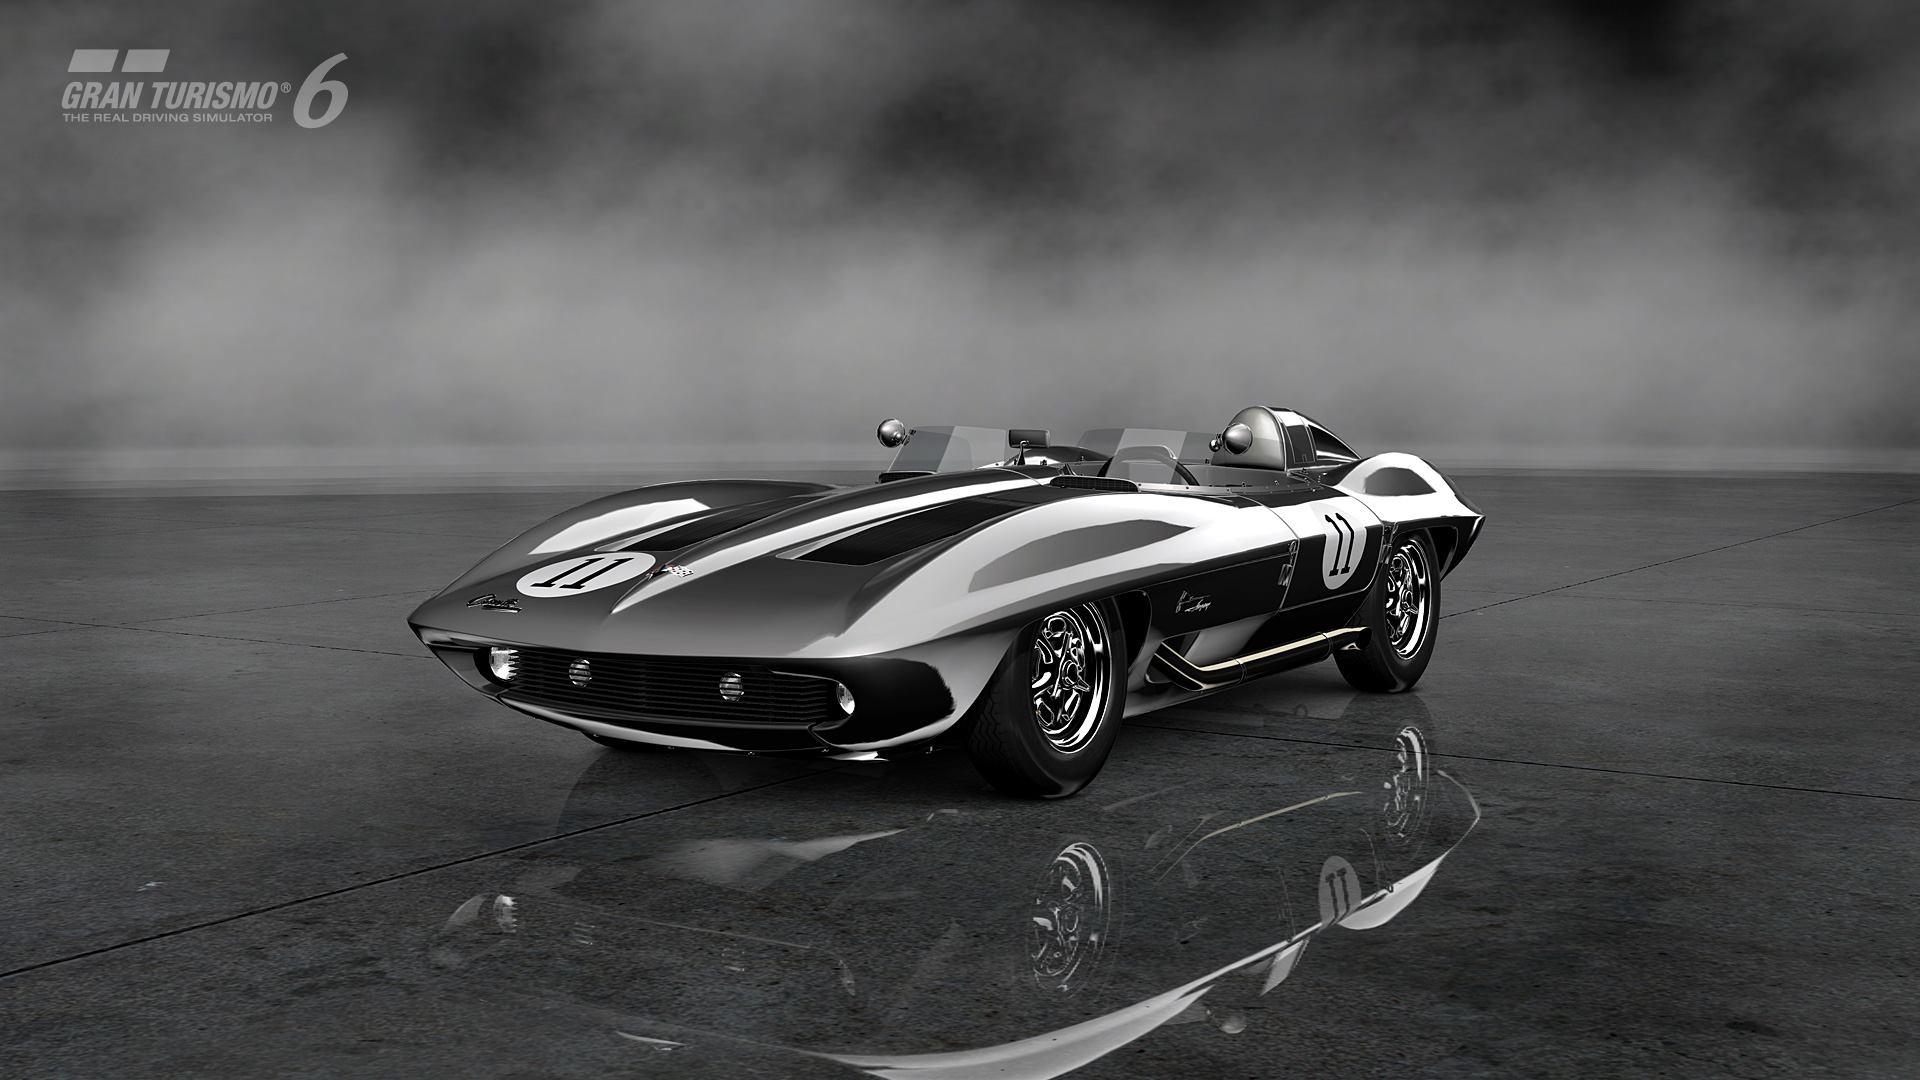 Gran Turismo 6 Wallpaper 47684 1920x1080px 1920x1080